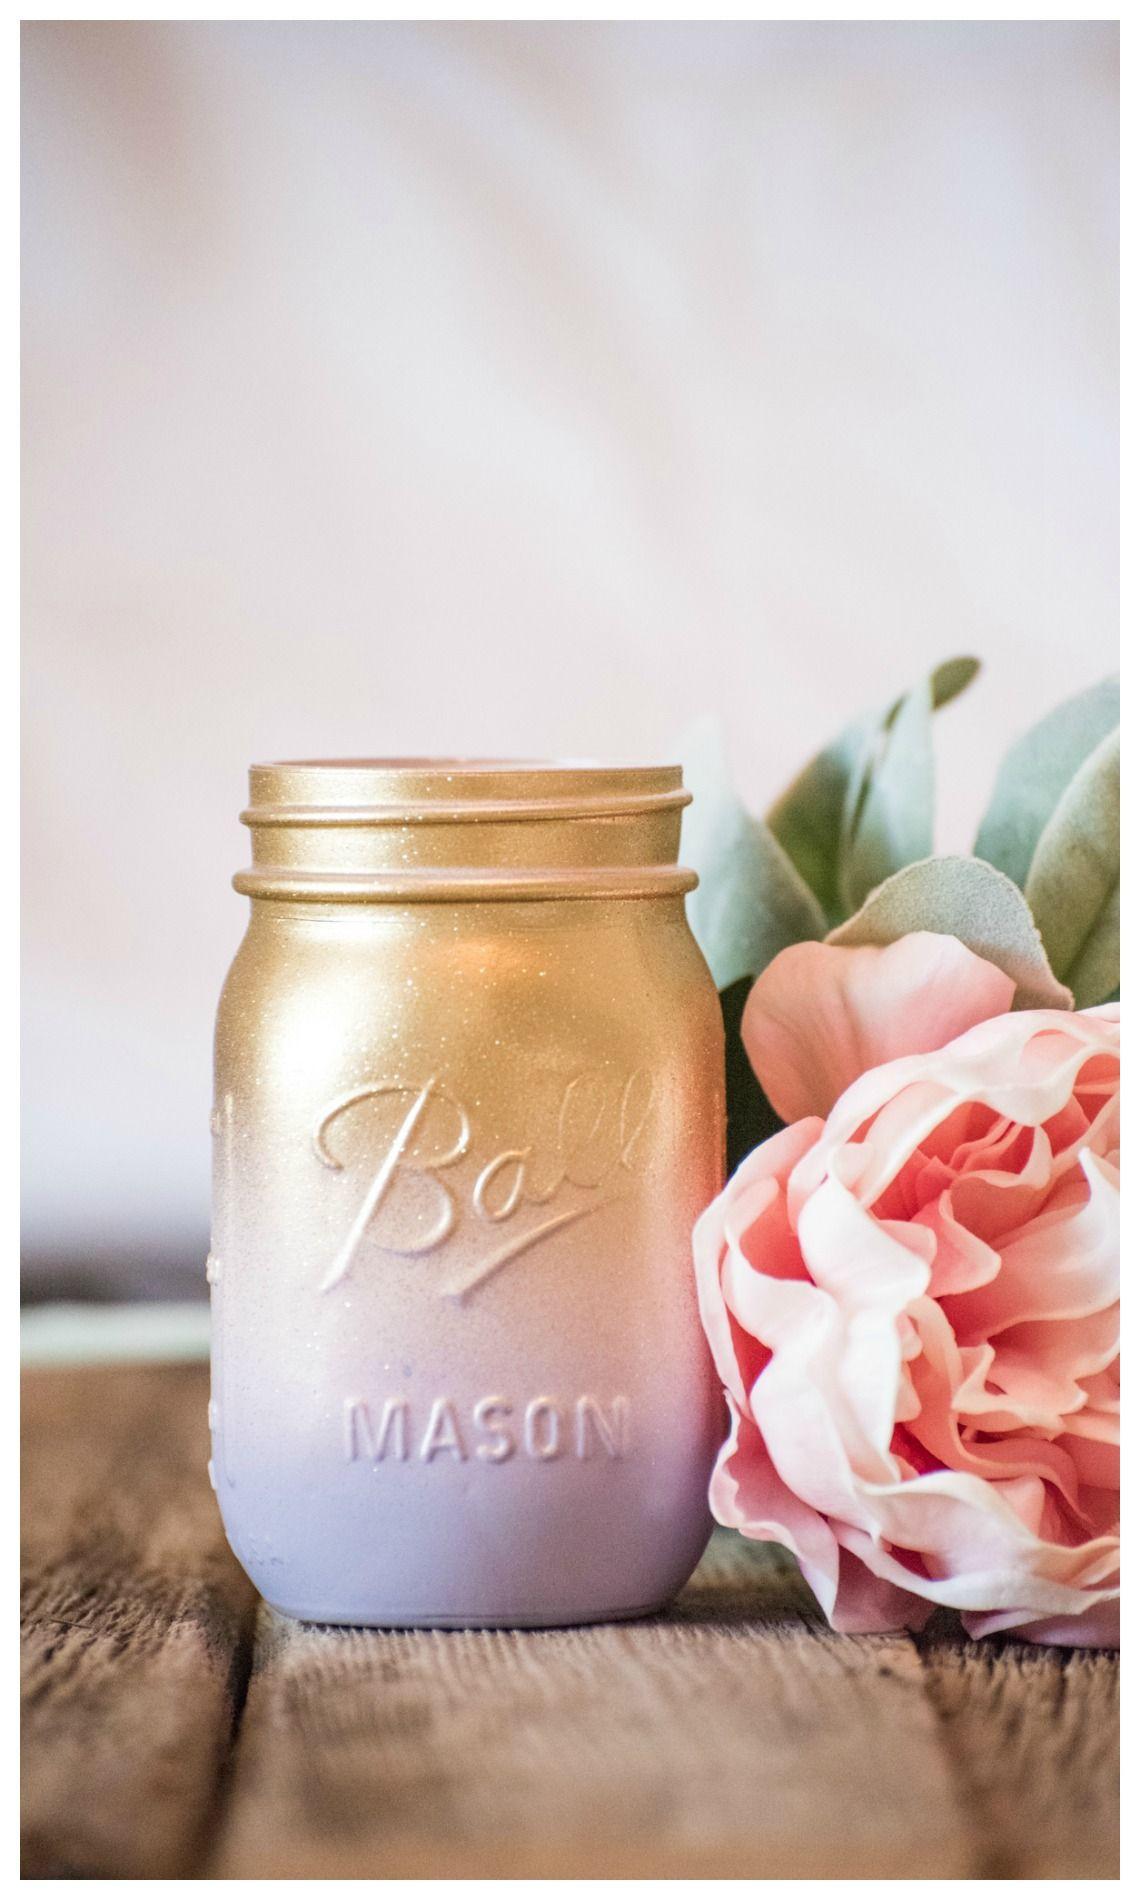 rose gold glitter vase of easter mason jar centerpiece vase flowers purple peach gold glitter within easter mason jar centerpiece vase flowers purple peach gold glitter